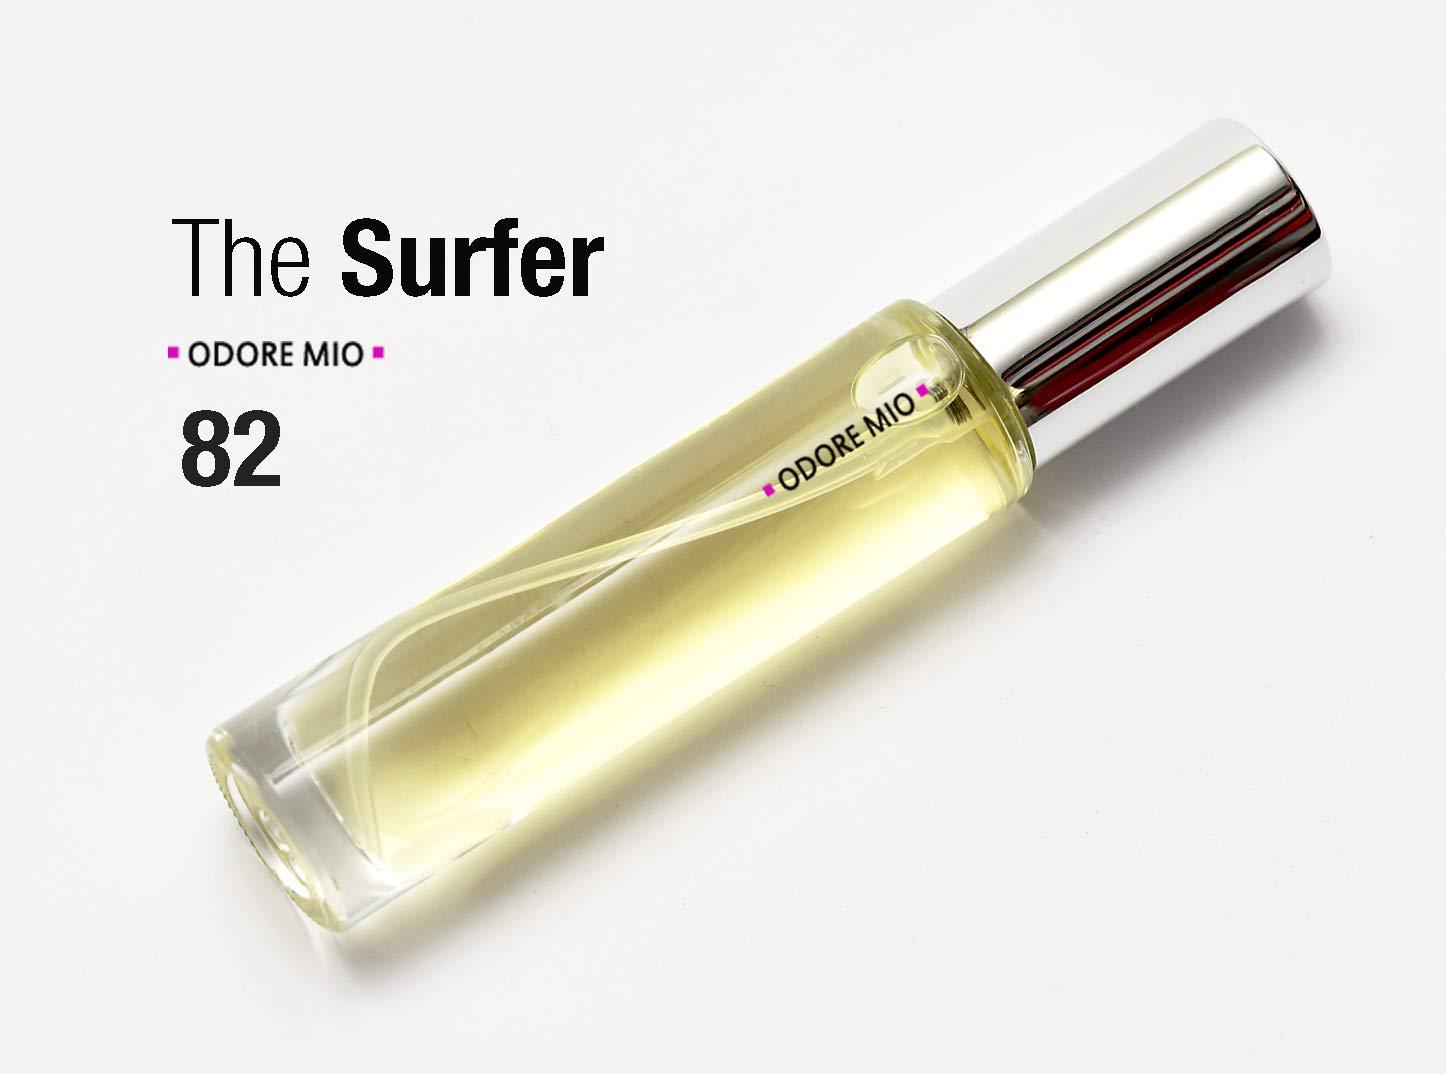 Odore Mio The Surfer Eau de Cologne 3 ml Sample Natural Perfume Spray